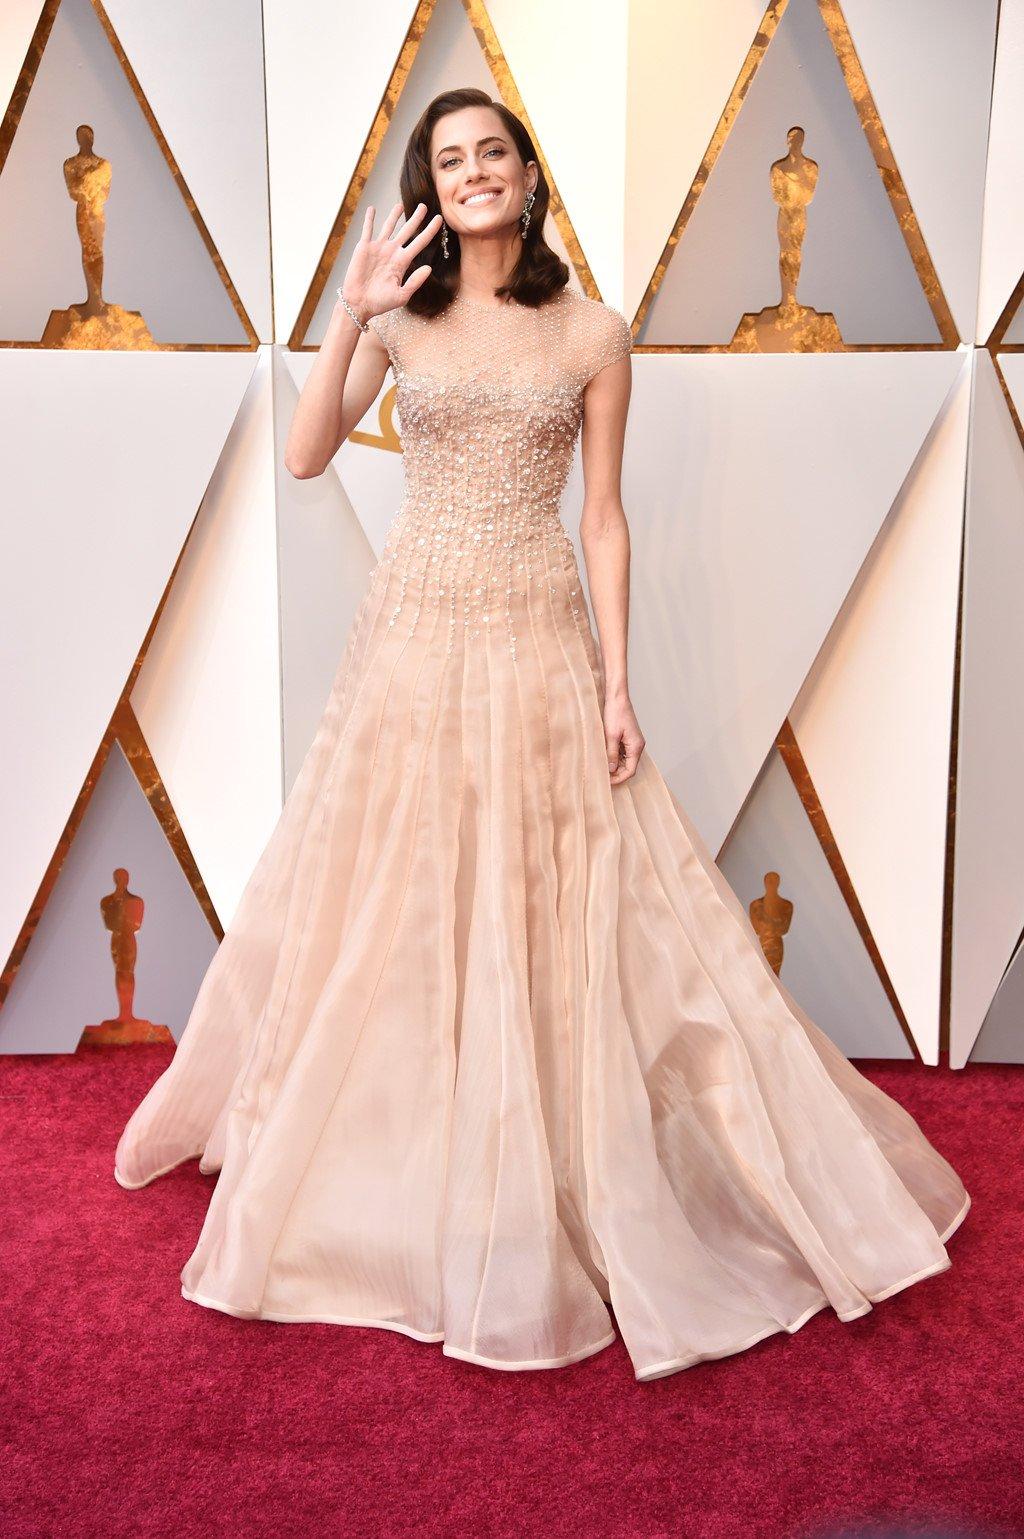 My nhan Hollywood long lay tren tham do Oscar 2018 hinh anh 1